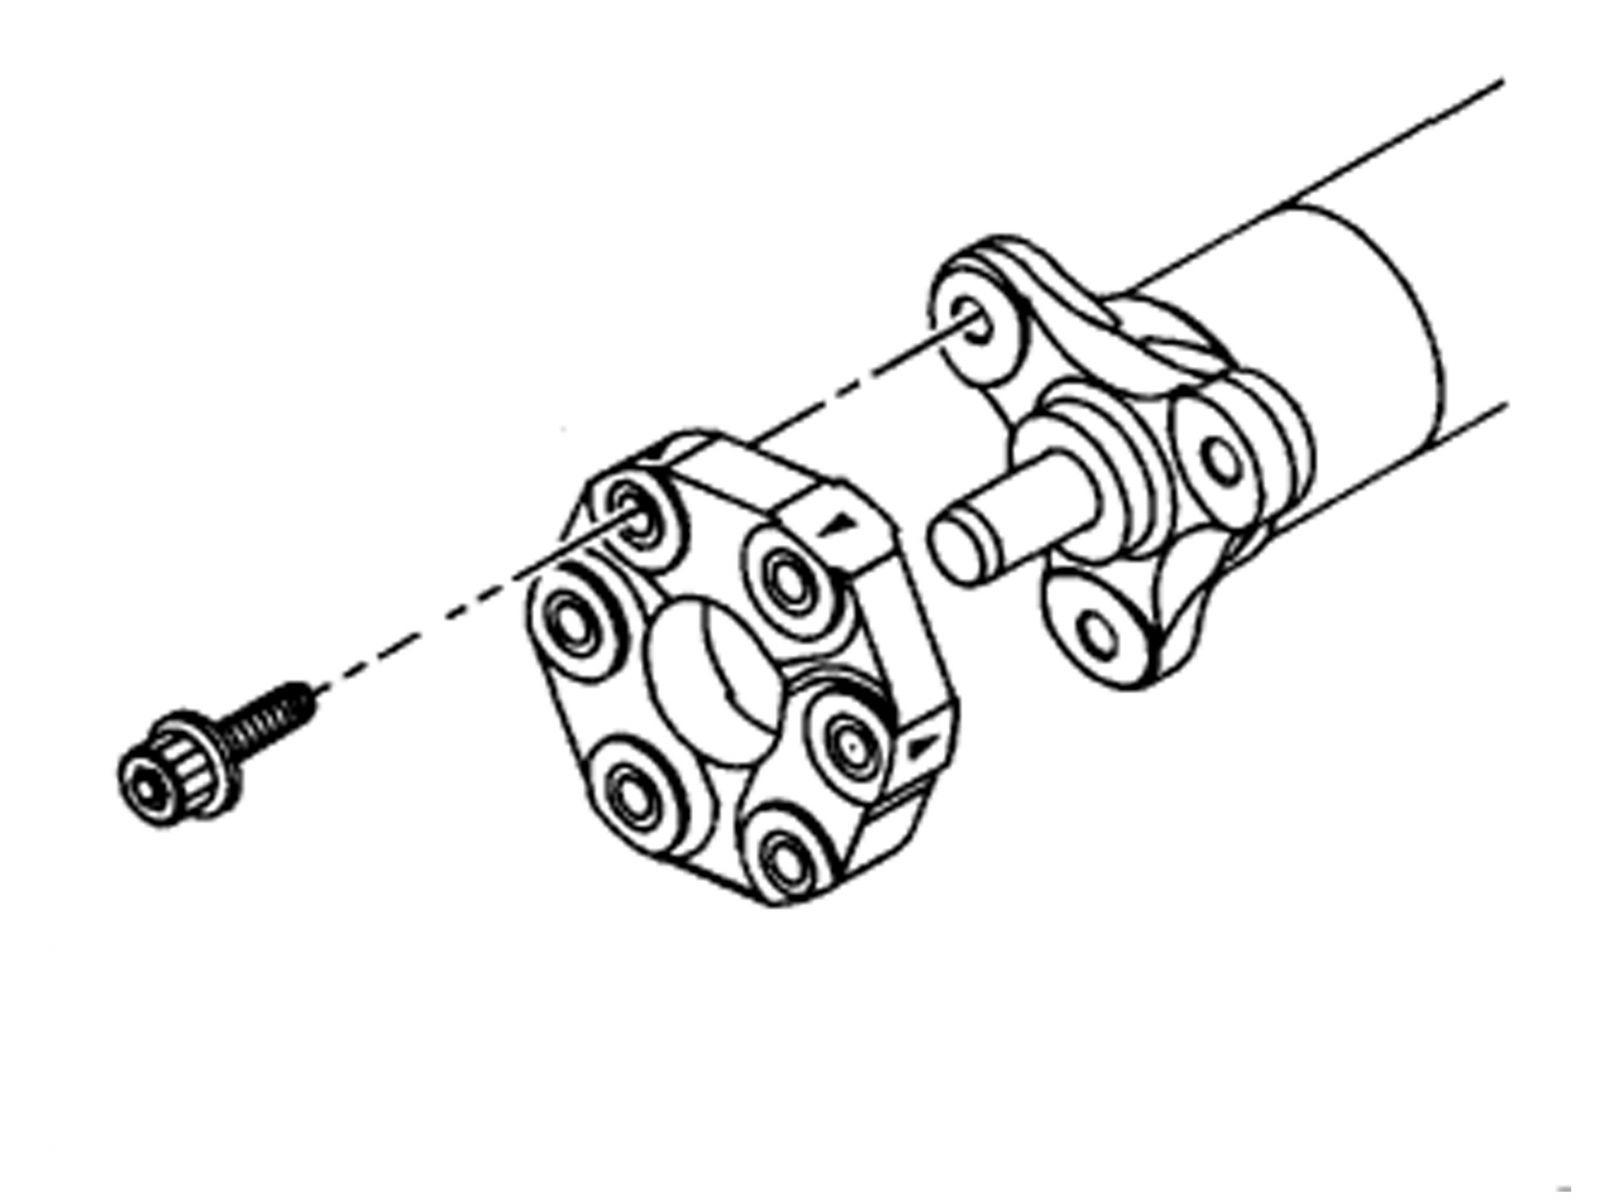 Chevrolet C5 Corvette Manual Torque Tube 10mm